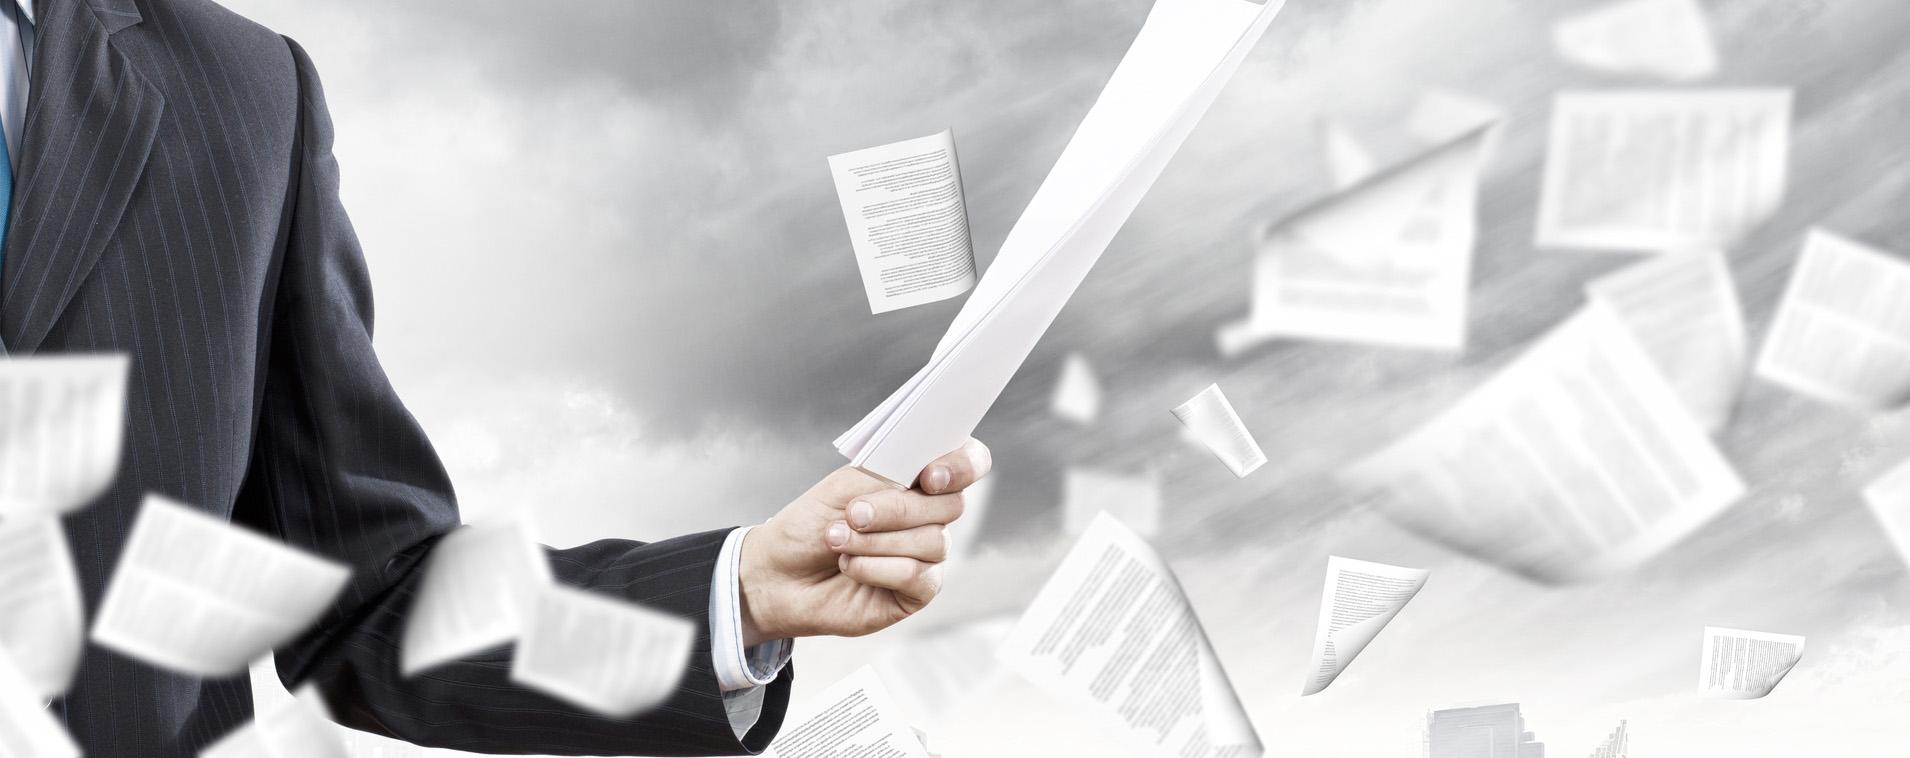 document_scanning_process.jpg